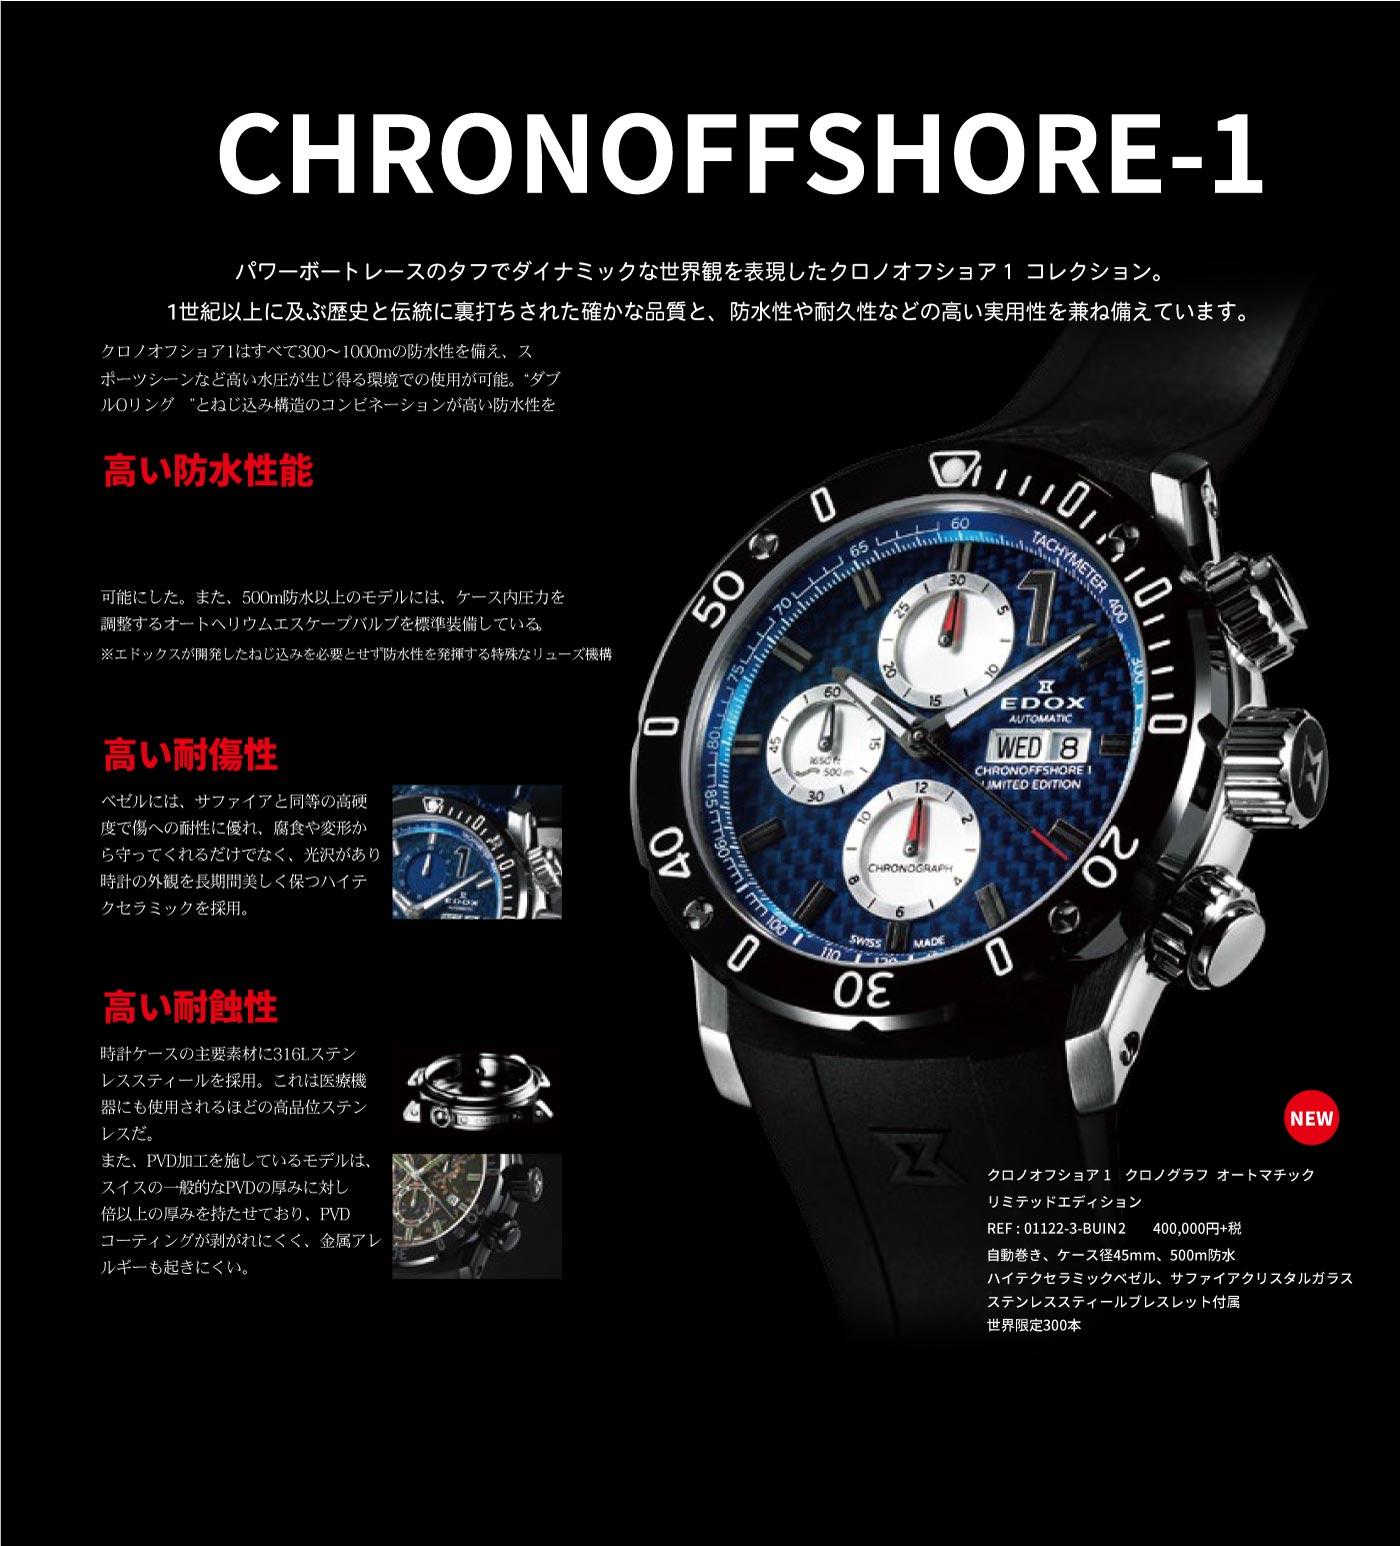 chronooffshore_1_news_2016_12